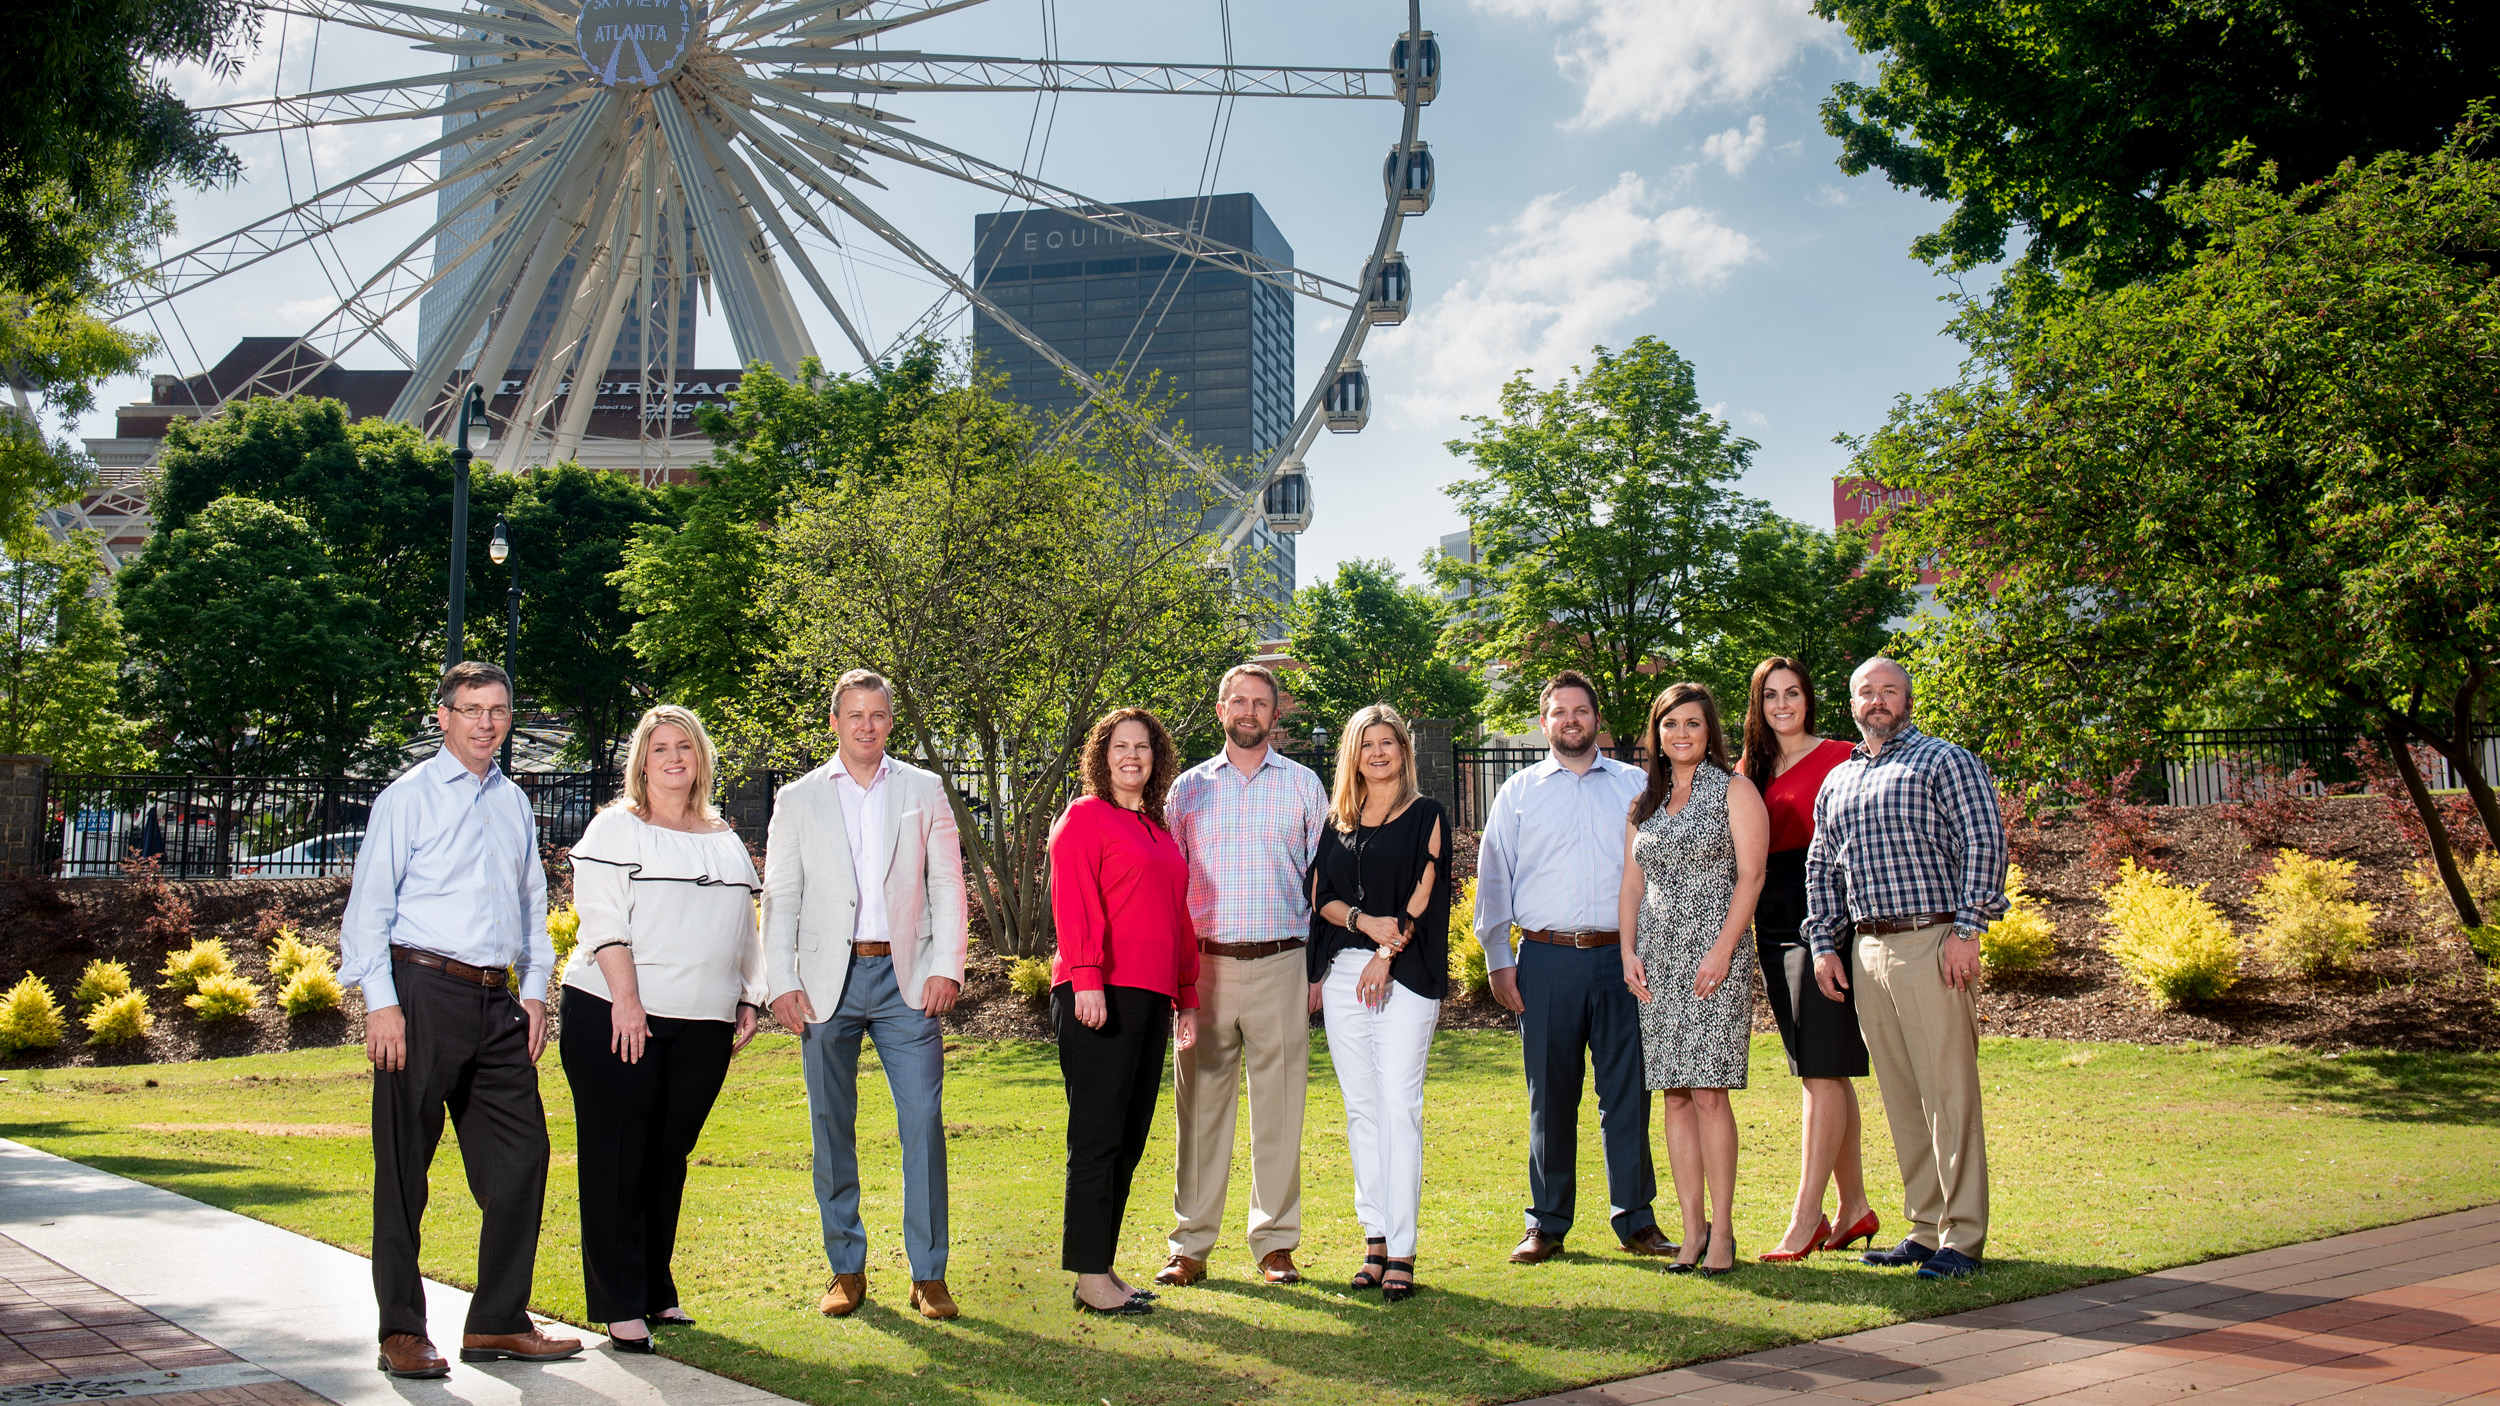 Corporate-Headshots-Photography-6.jpg